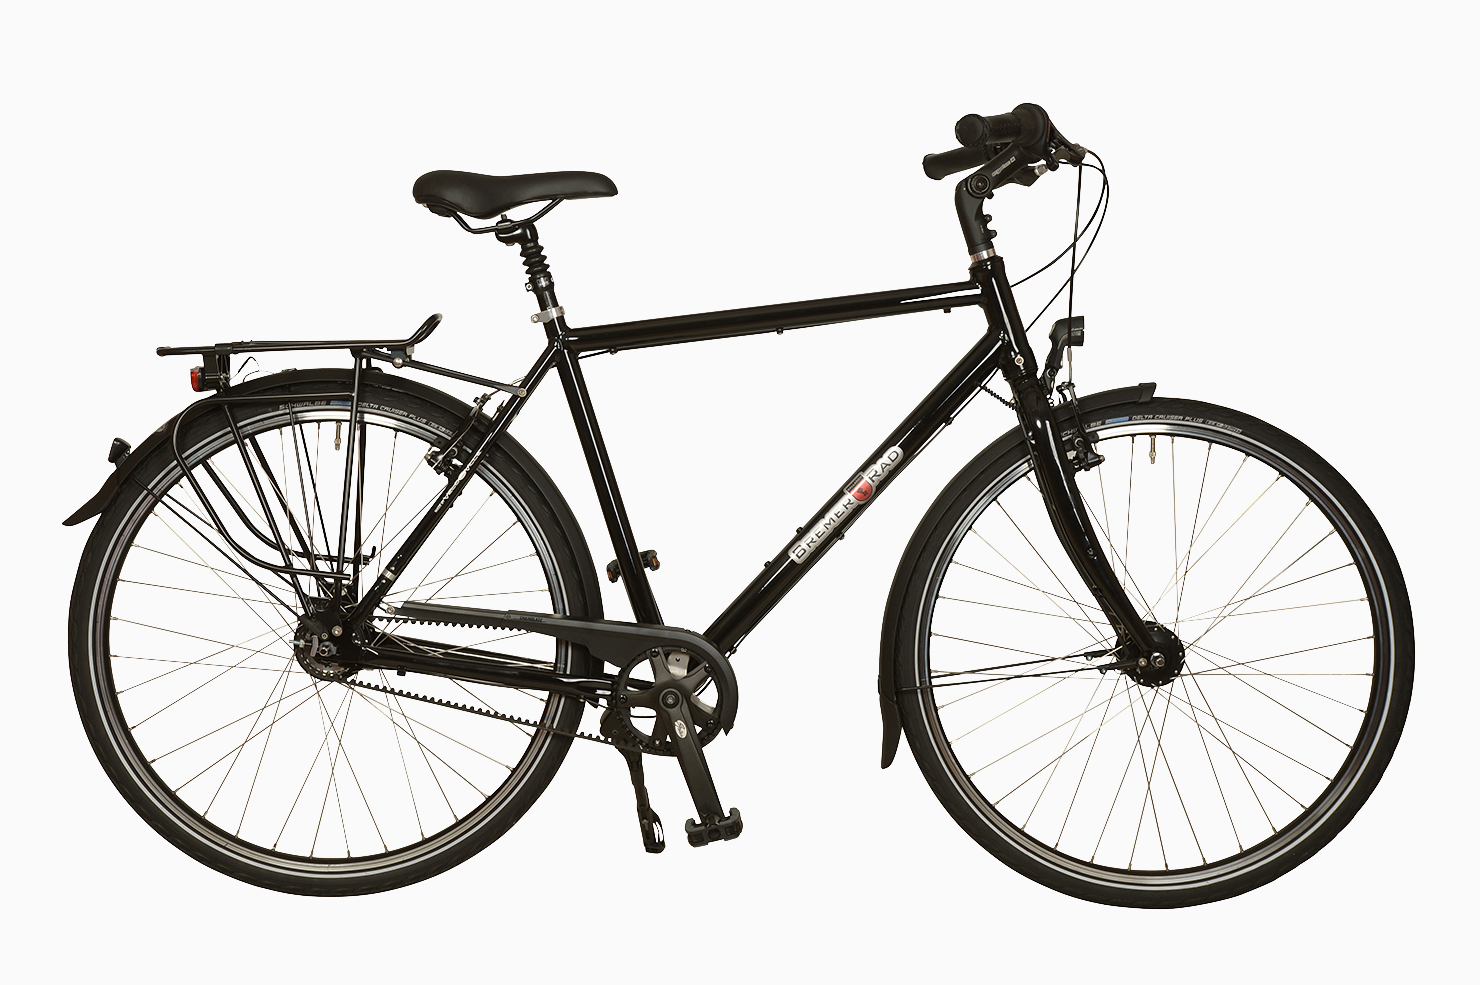 Fahrrad Retro Englisch Glocke Glocke Aluminium blau rot Fahrrad Glocke Vintage